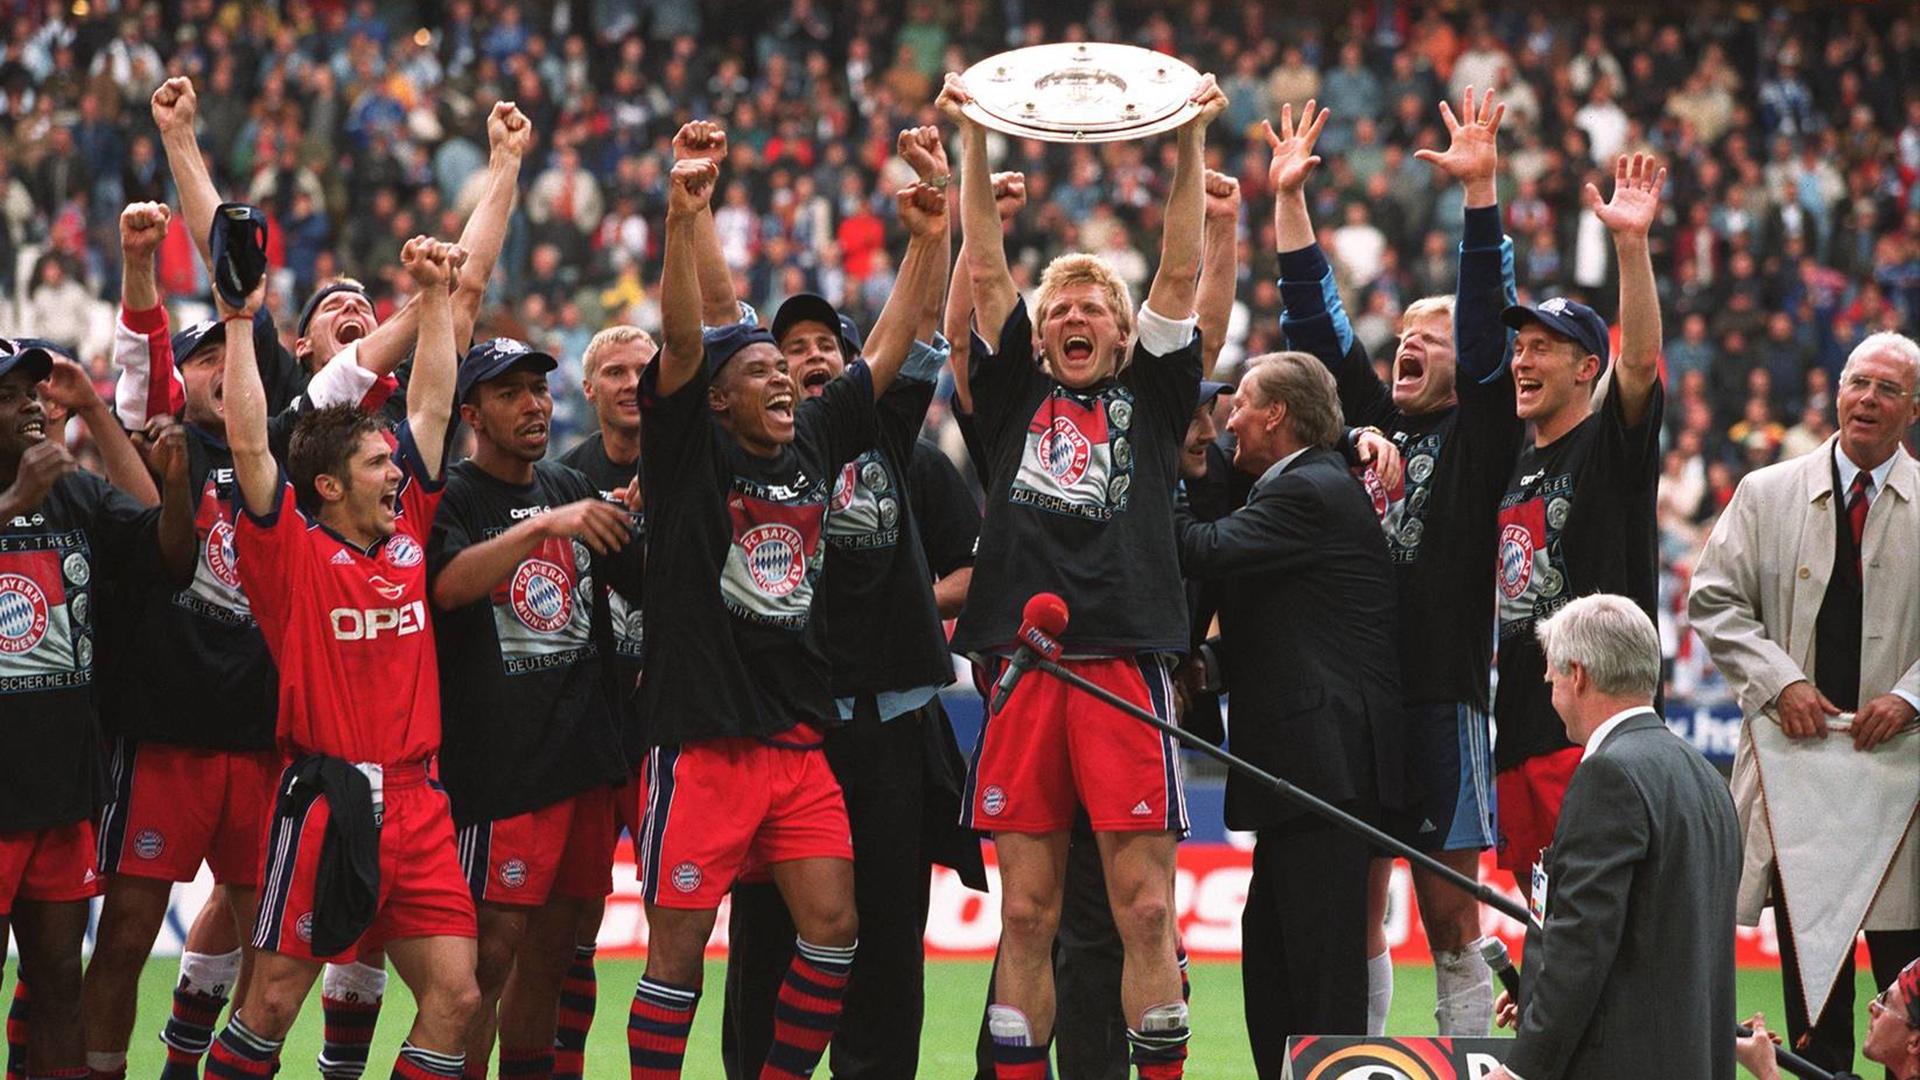 Бавария - чемпион Германии 2000/2001